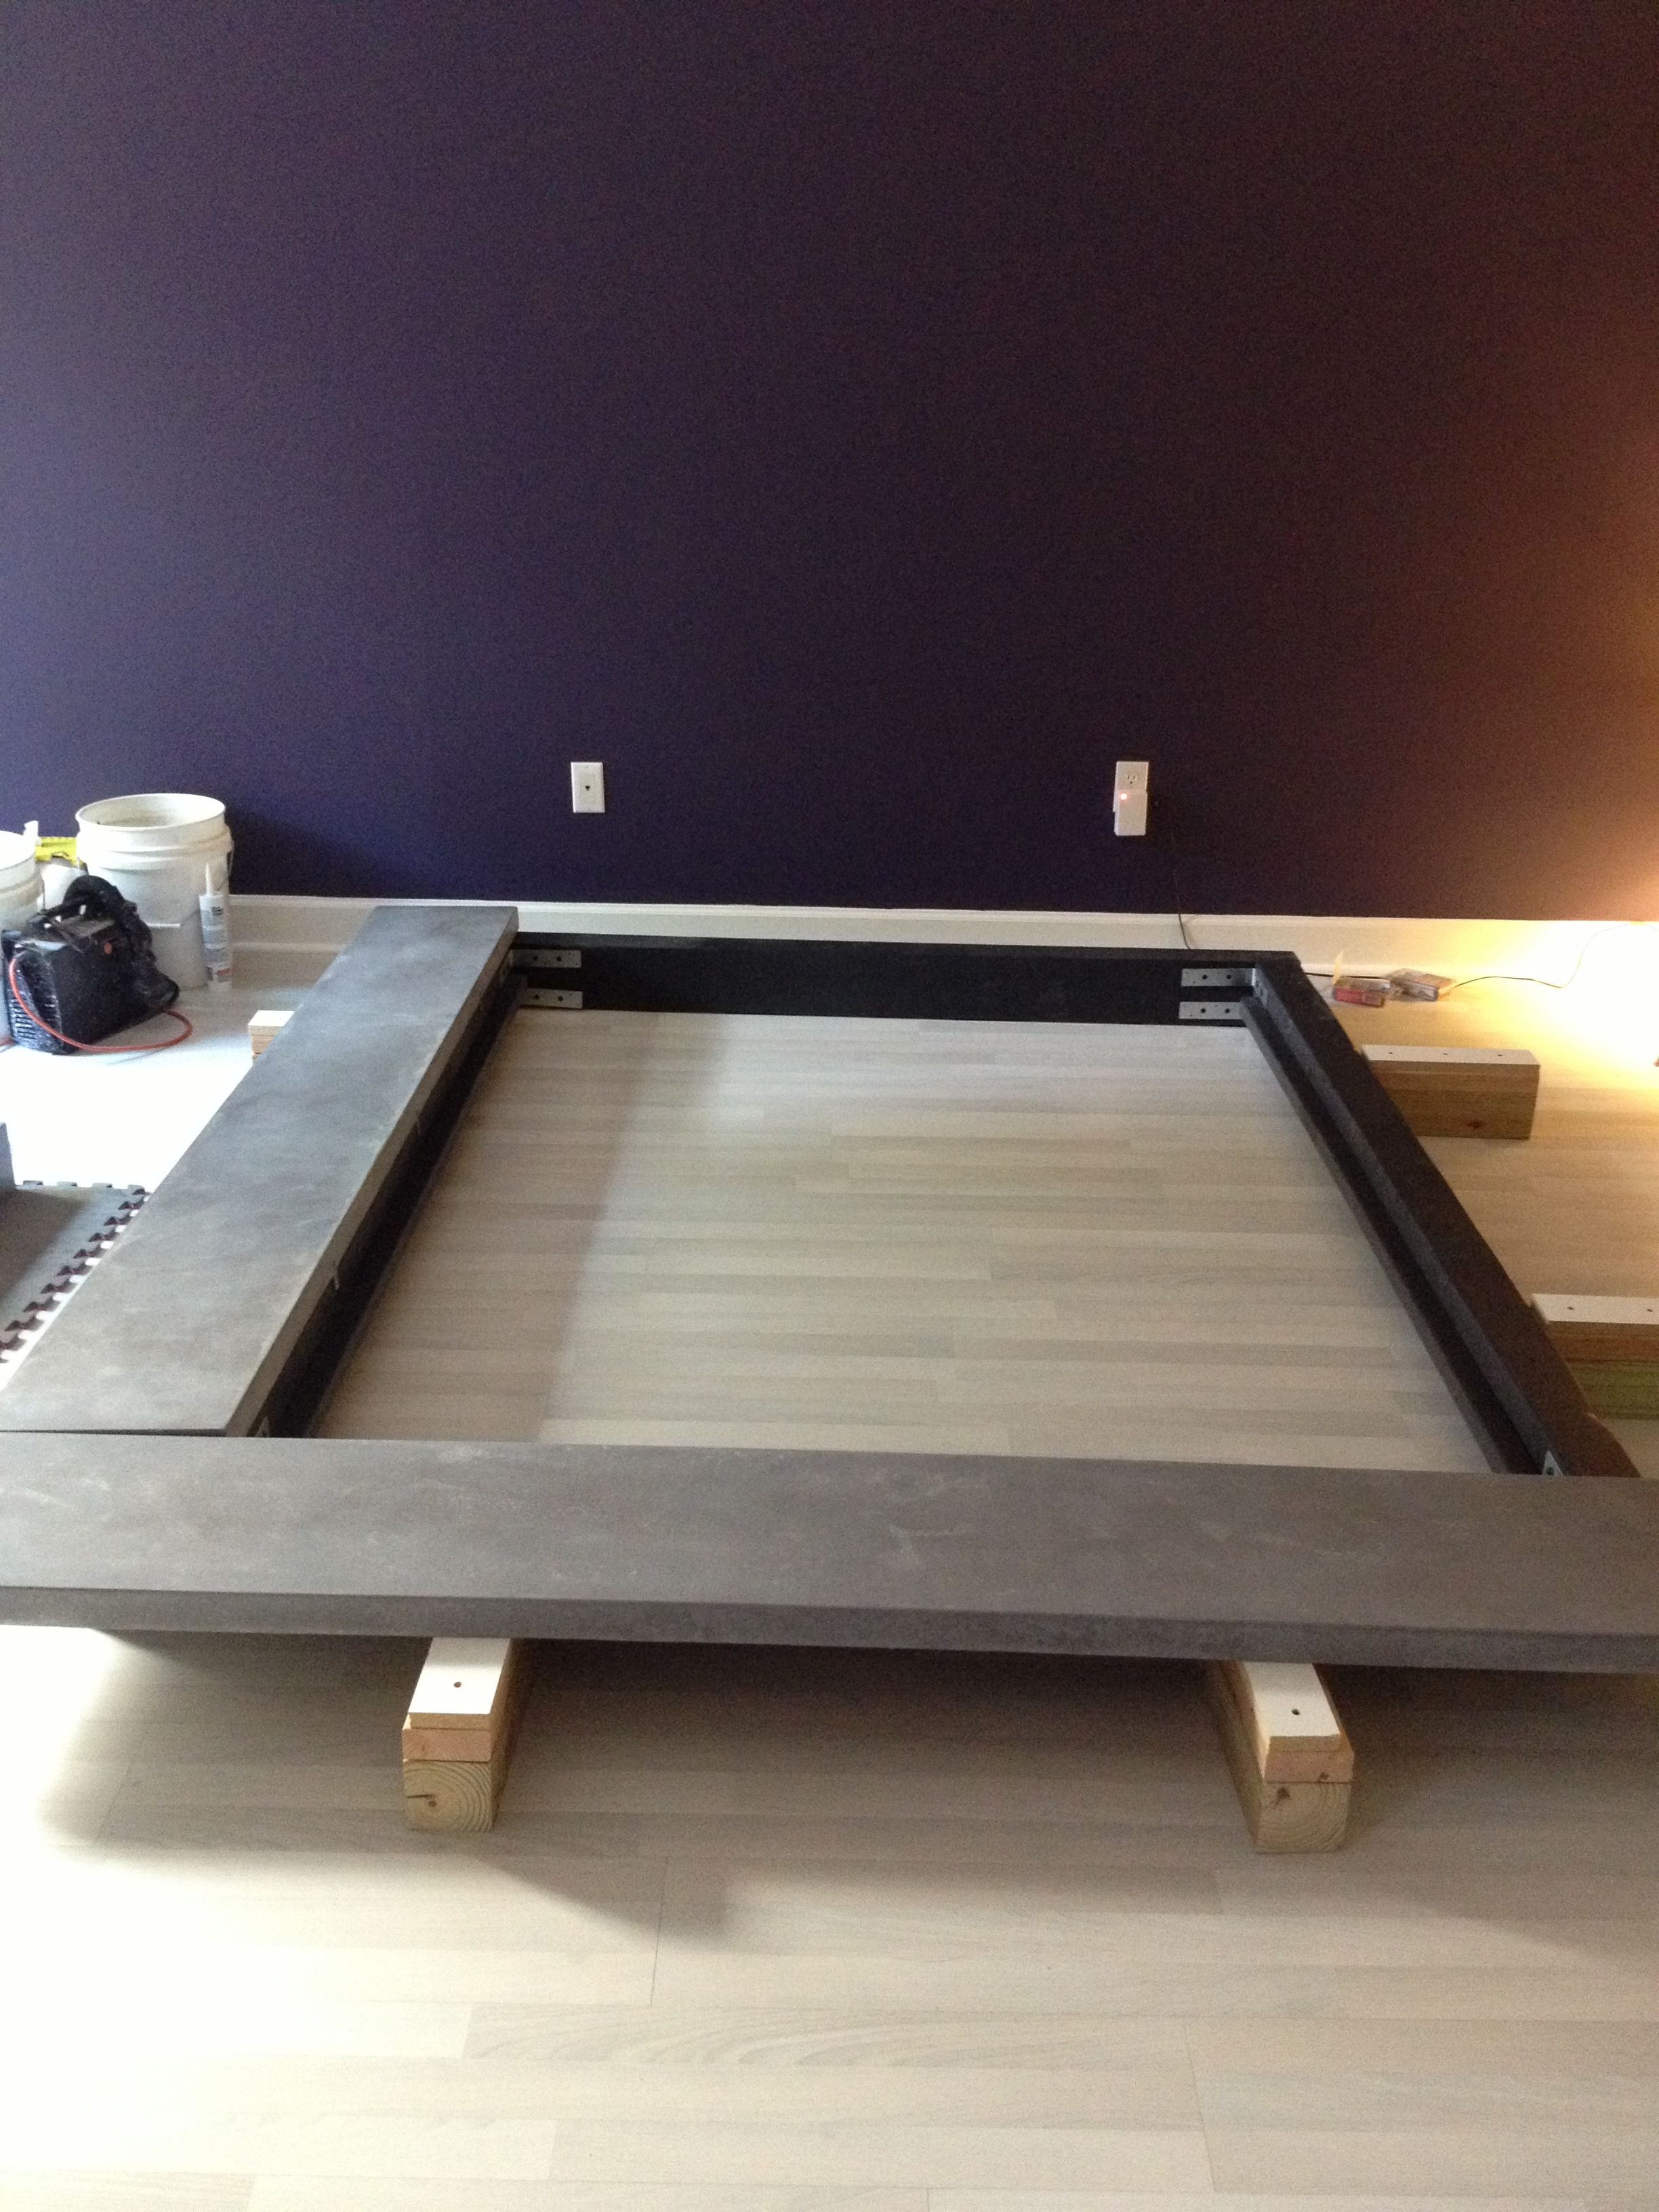 Homemade Bed Installing Concrete Frame Diy Homemade Beds